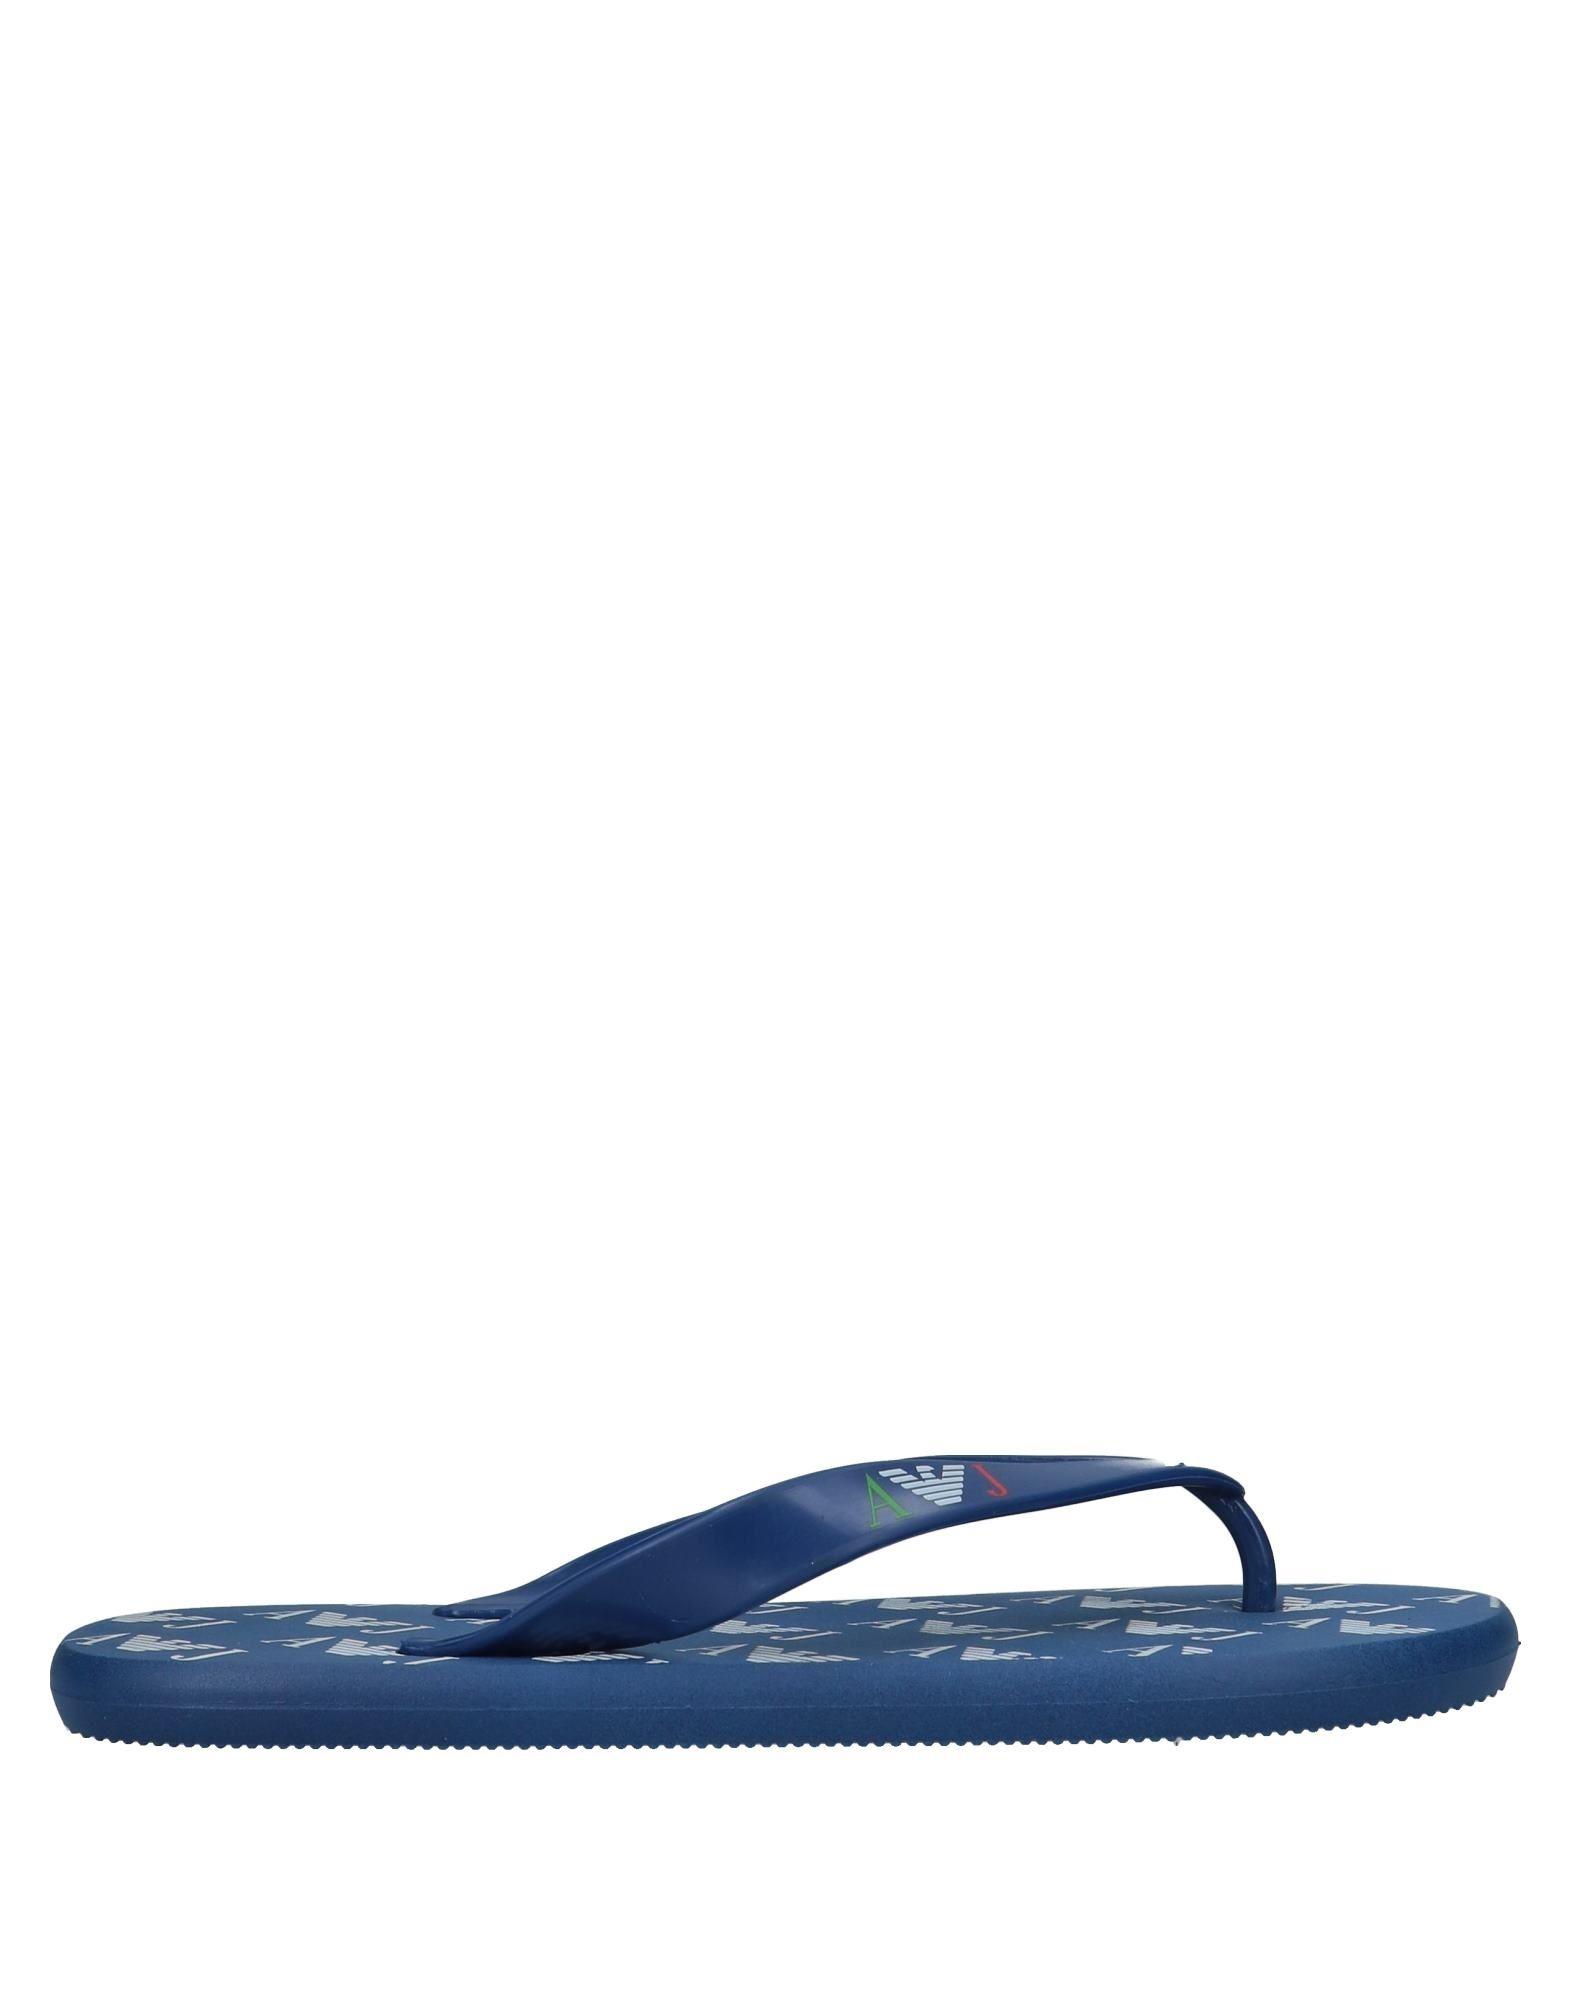 0a6590ce9 Armani Jeans Flip Flops - Men Armani Jeans Flip Flops online on YOOX ...